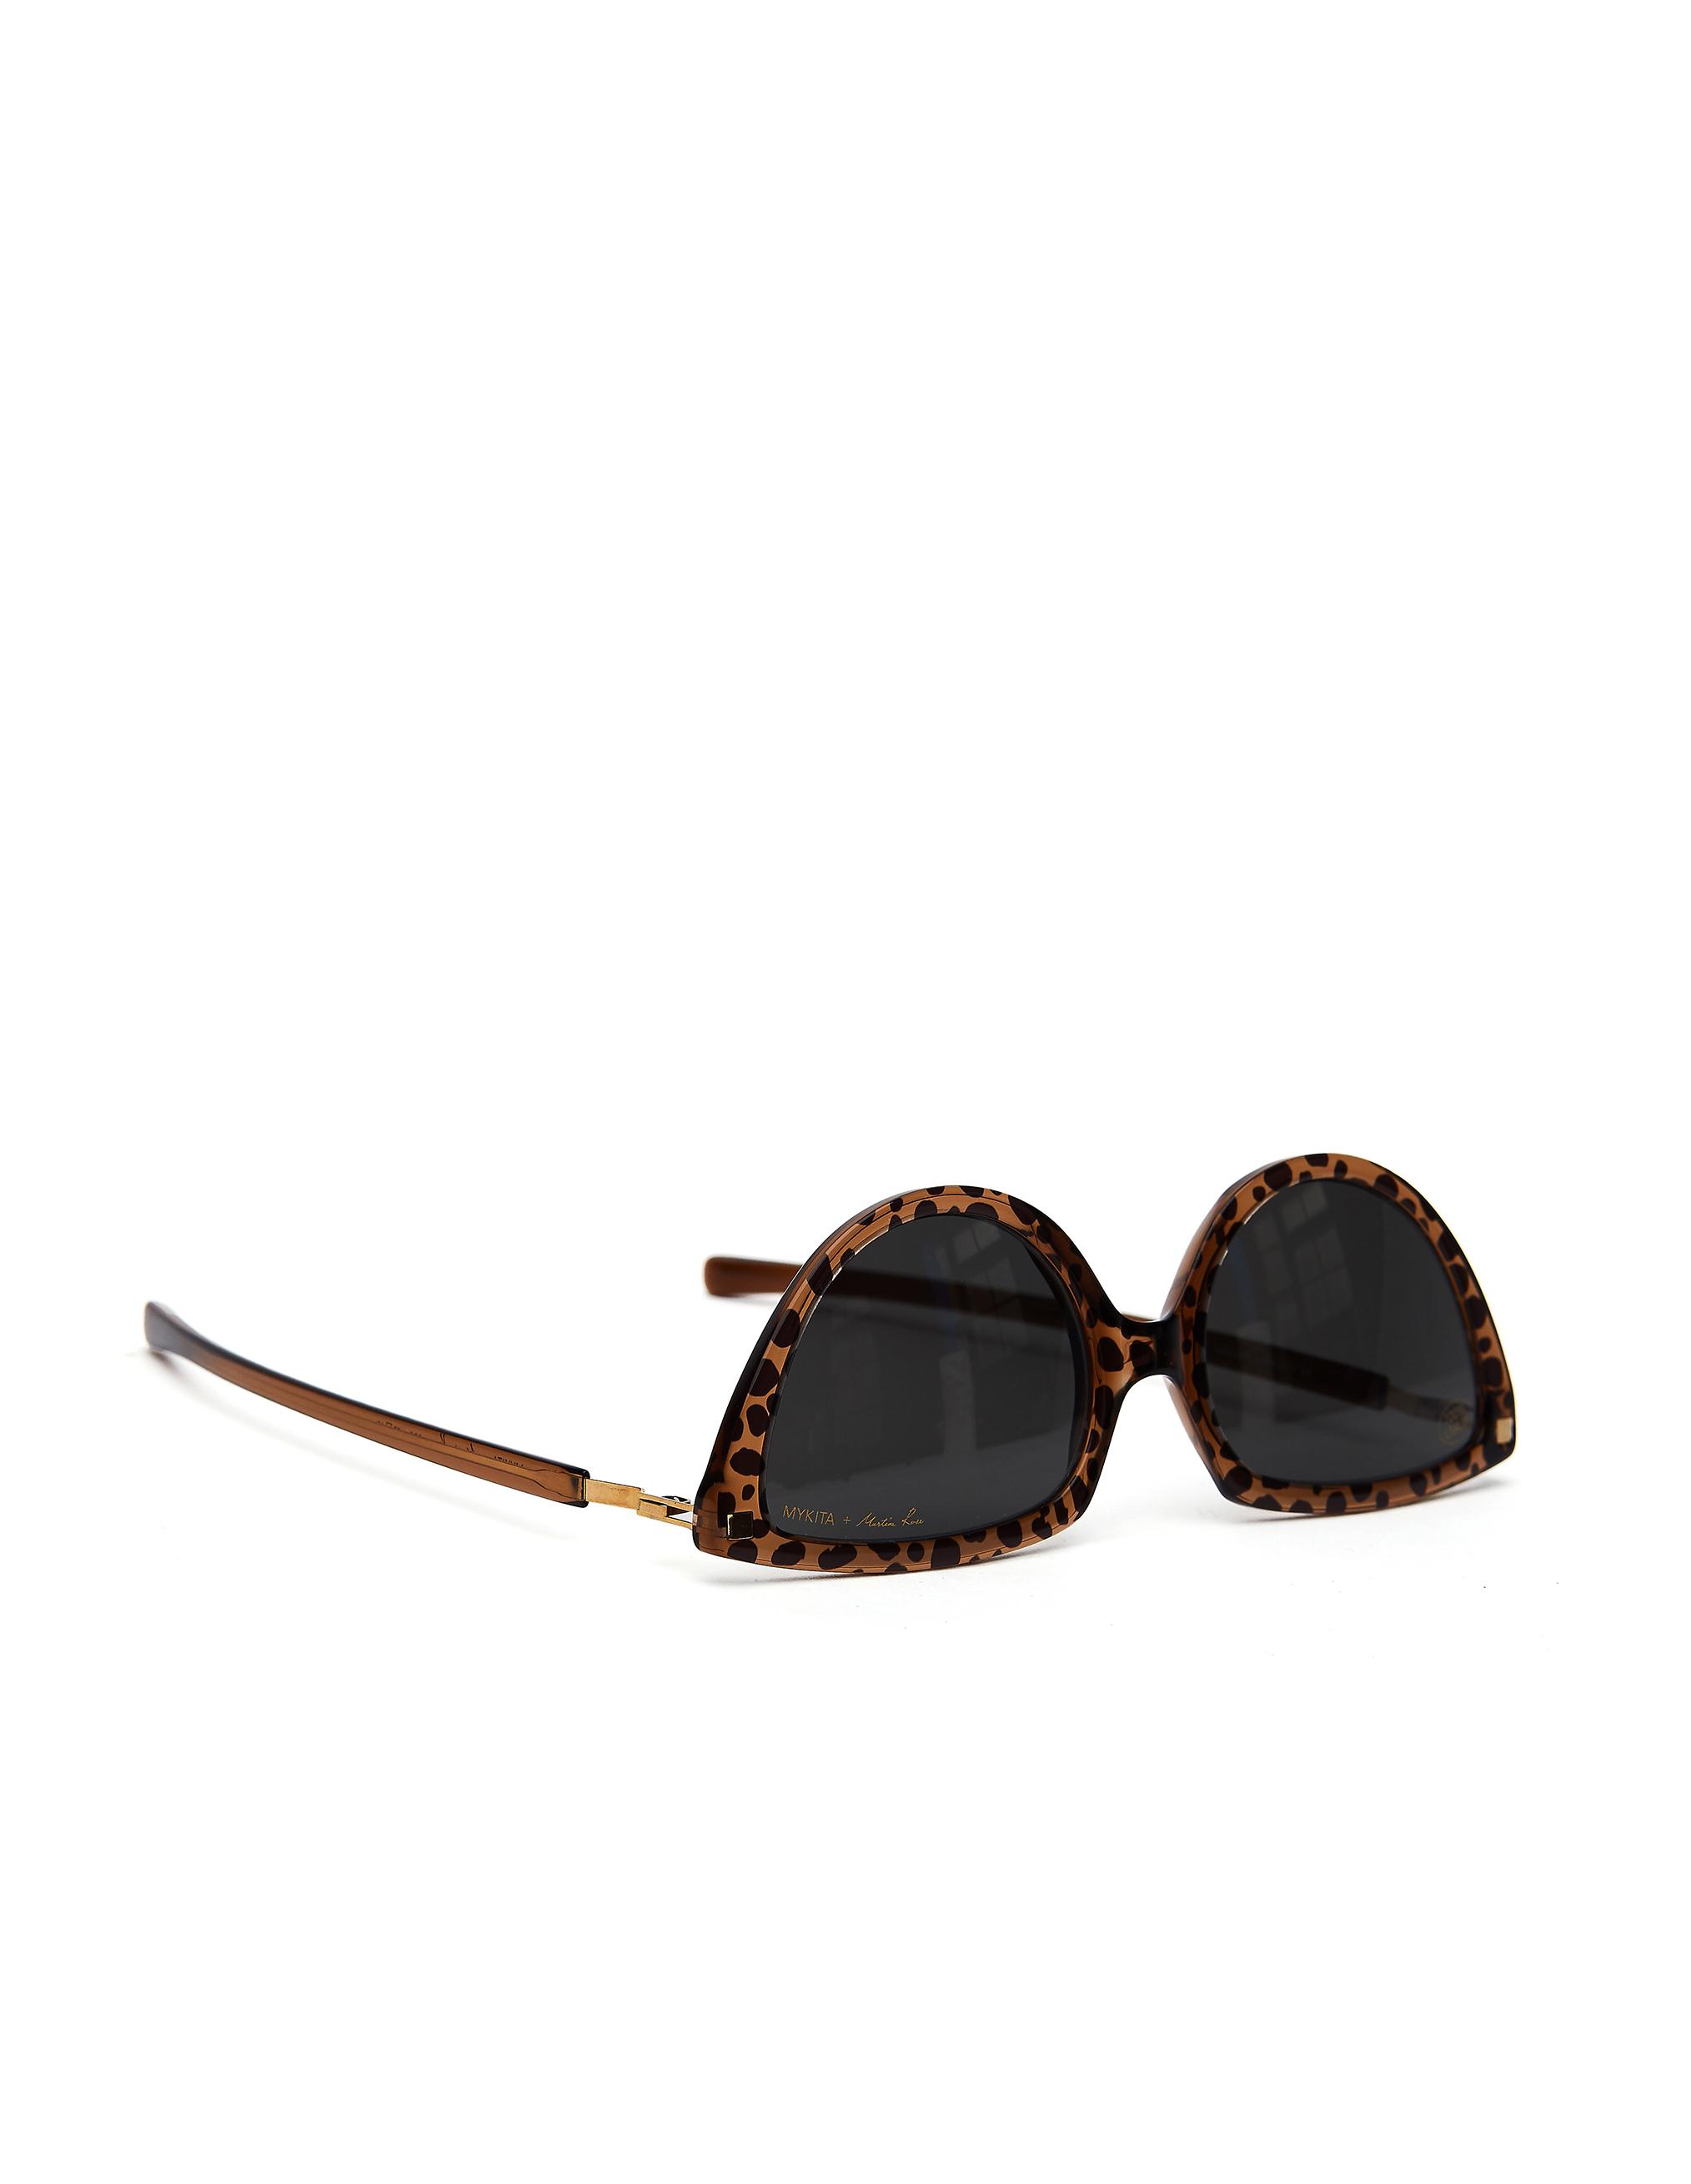 Mykita Topaz Leopard Mykita + Martine Rose «SOS» Sunglasses